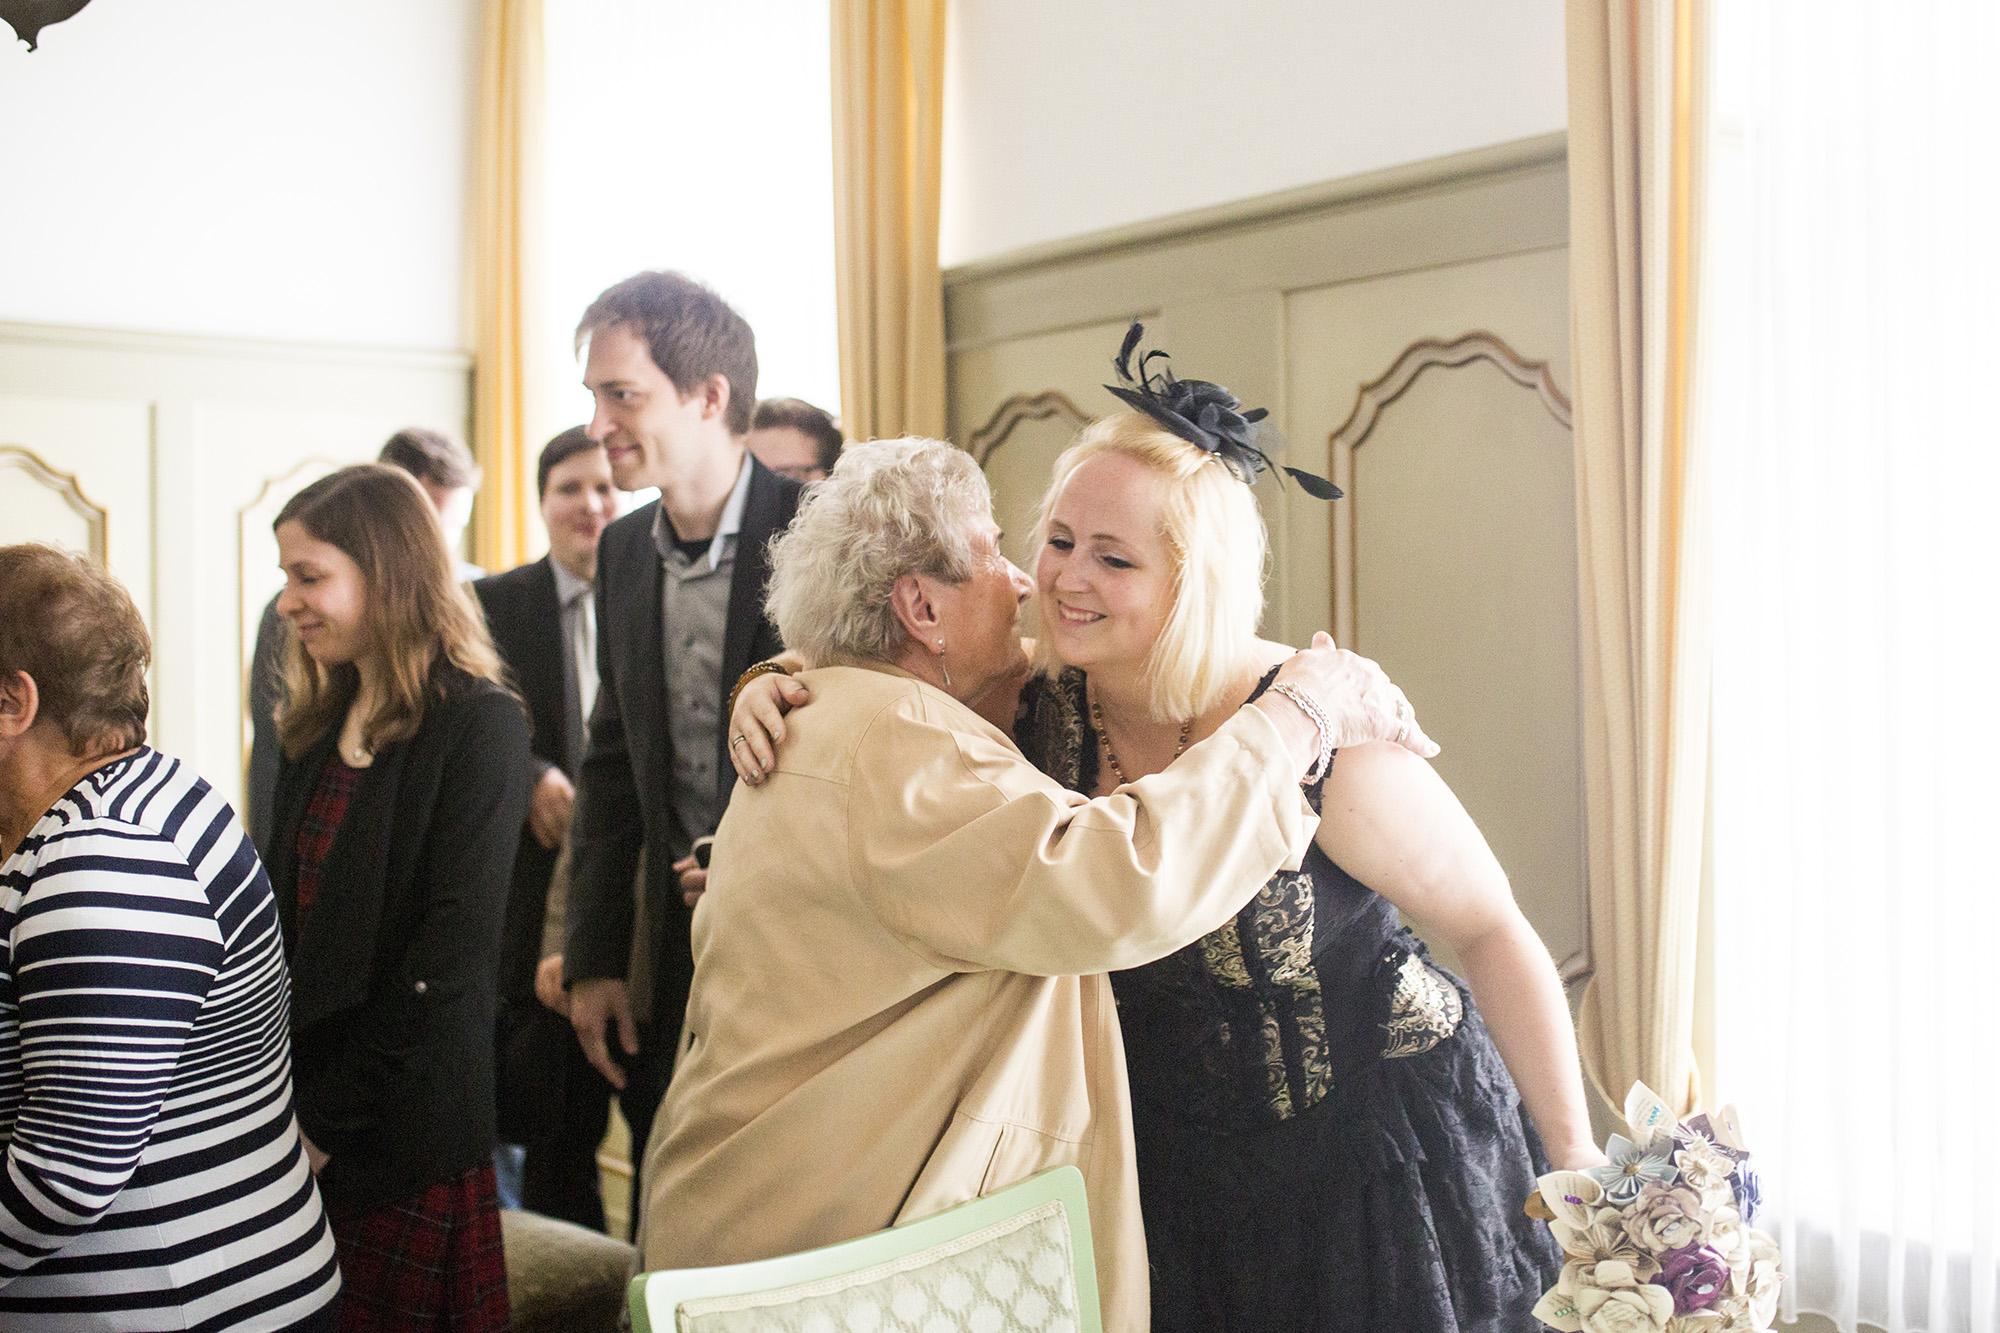 Seriously_Sabrina_Photography_Essen_Germany_RocknRoll_Hochzeit_Wedding_PatrickJenny43.jpg